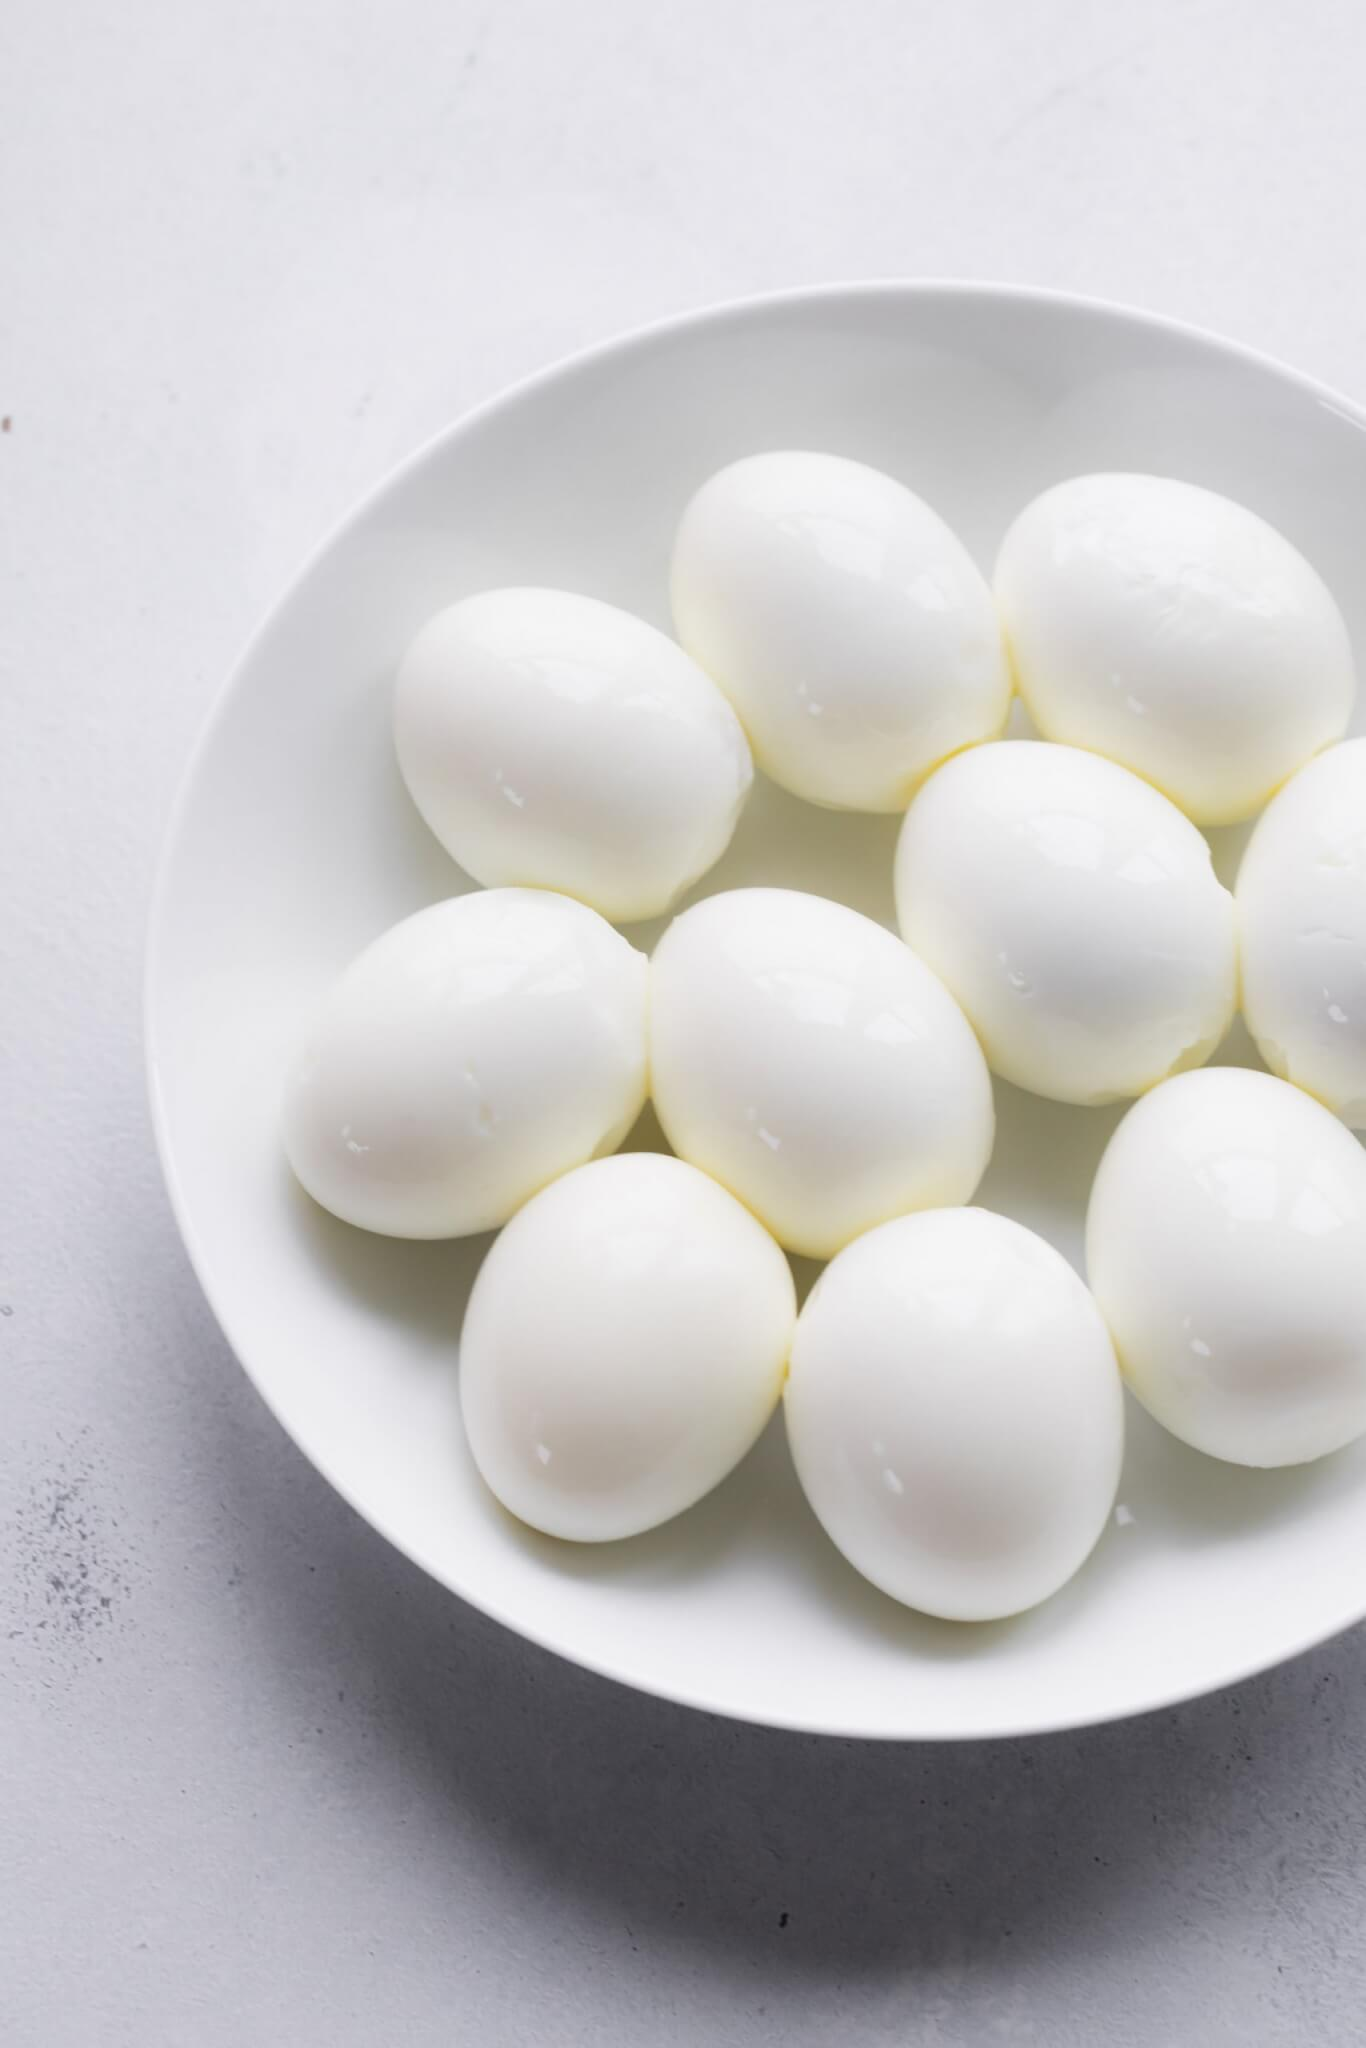 Bowl of peeled hard boiled eggs.